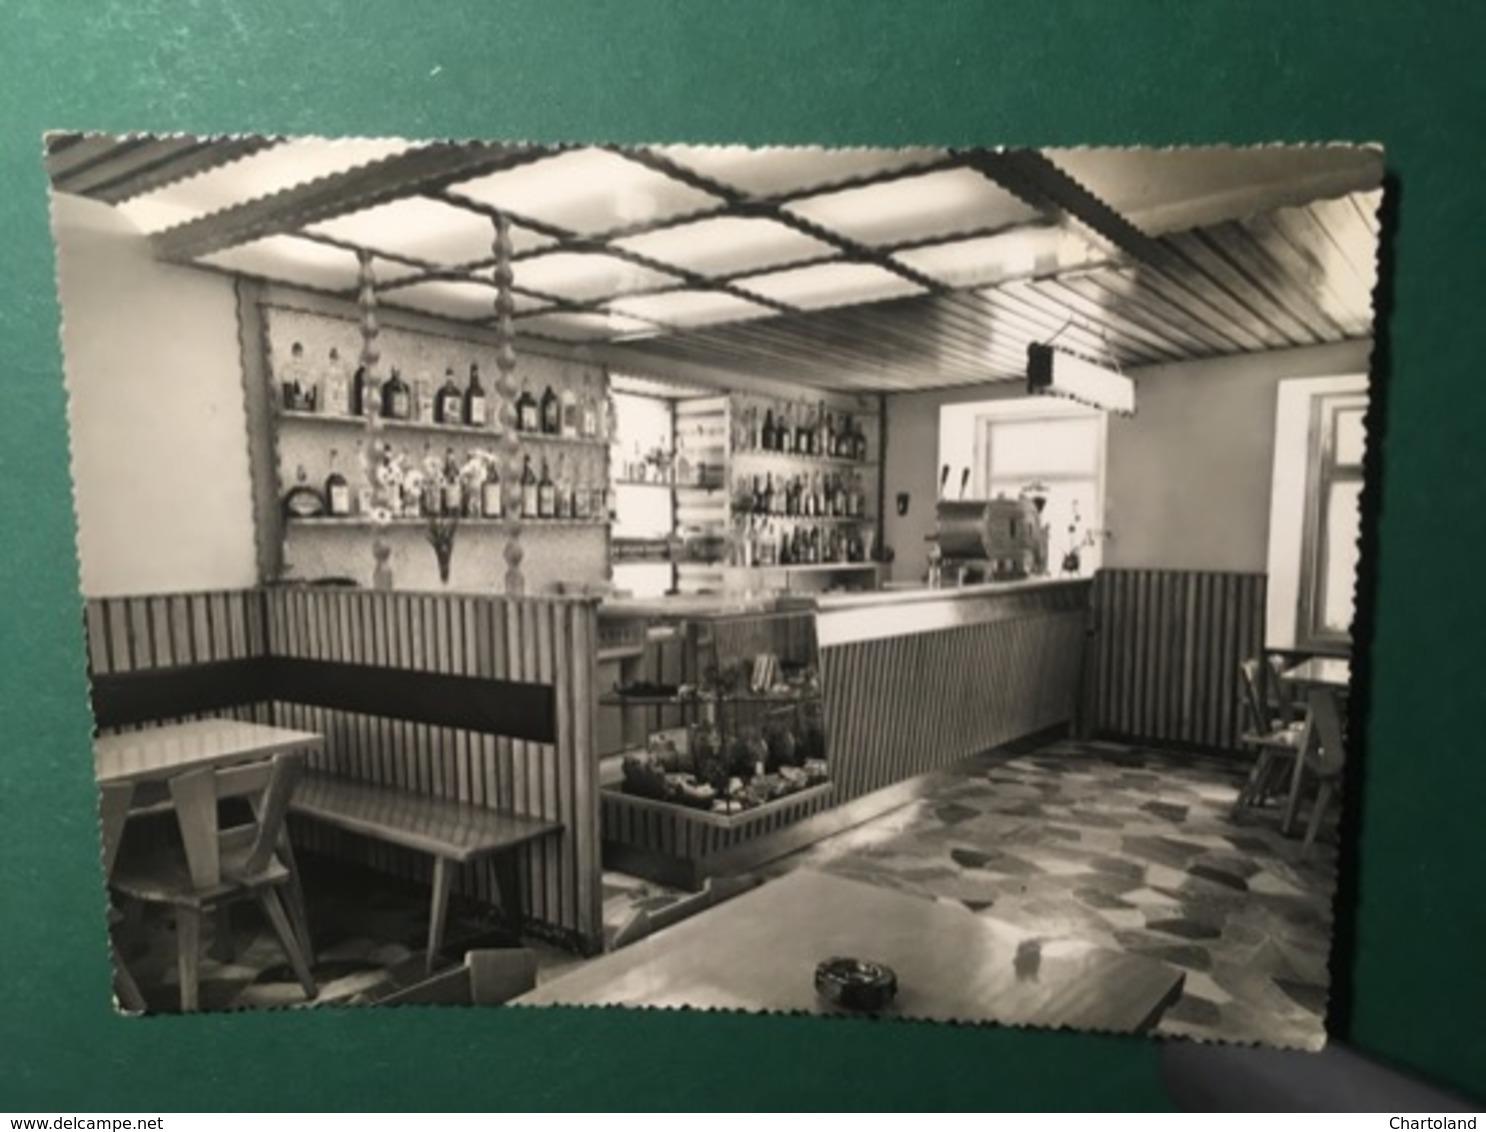 Cartolina Bar Albergo Al Sole - Sappada - 1958 - Belluno